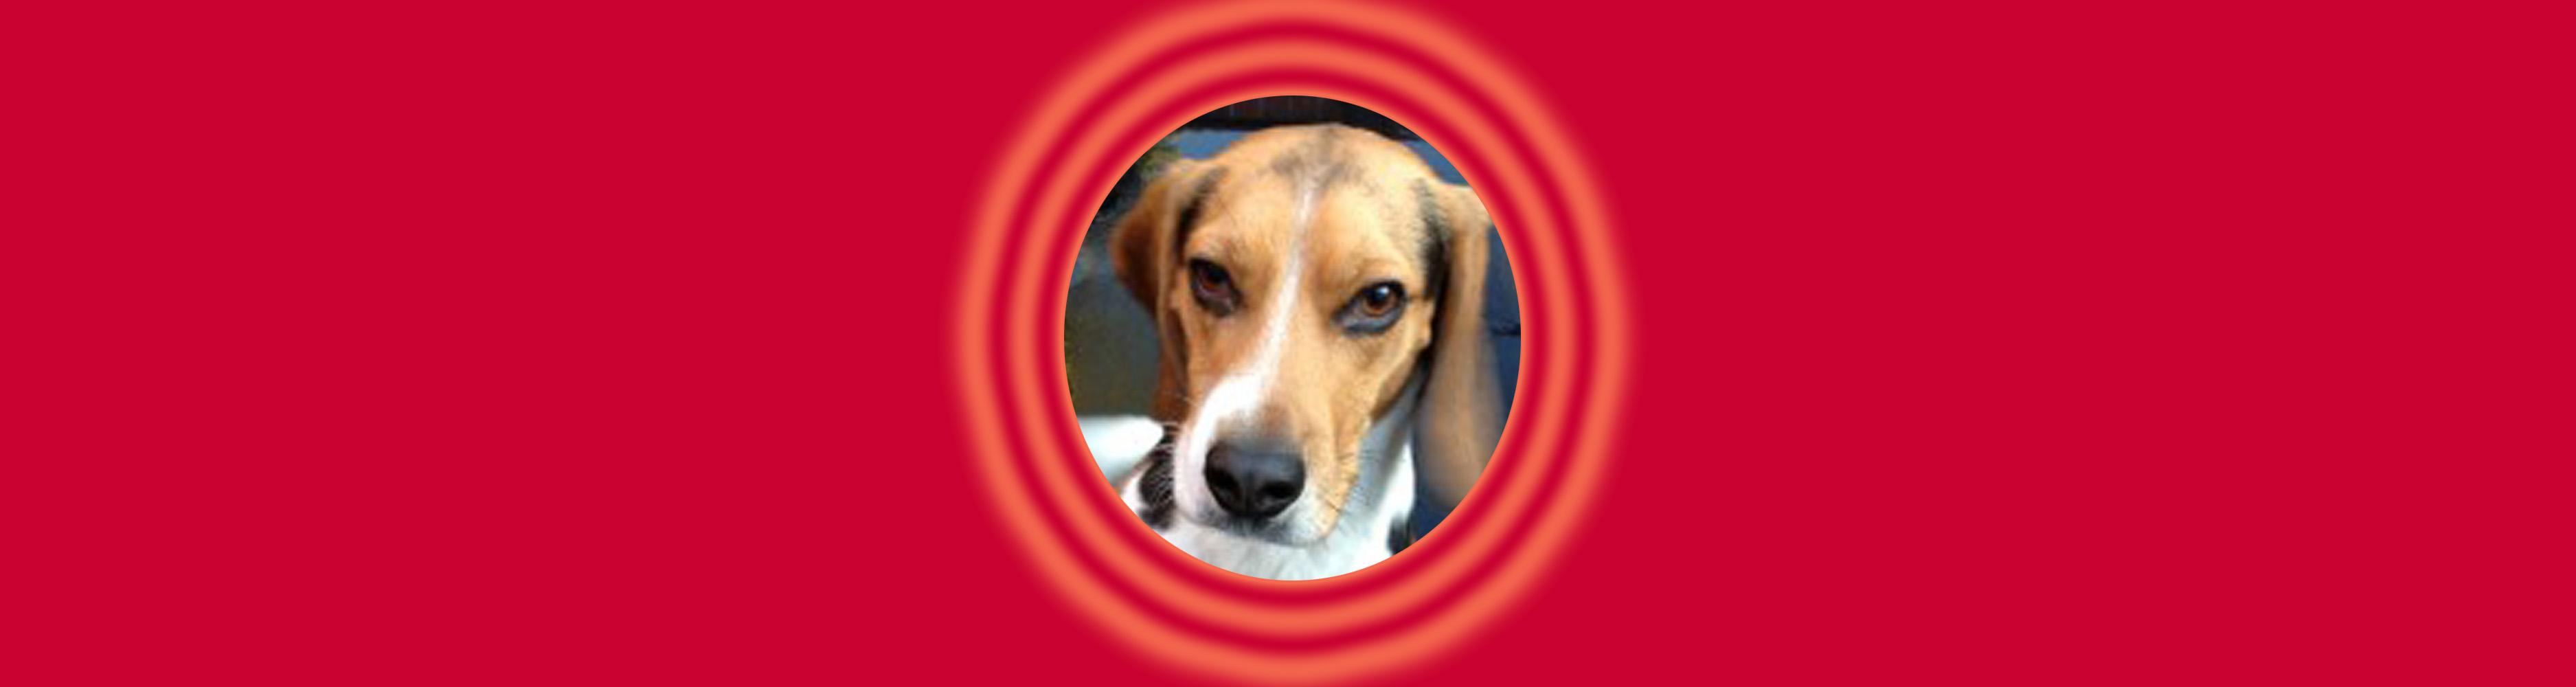 Dog of the Week: Dexter